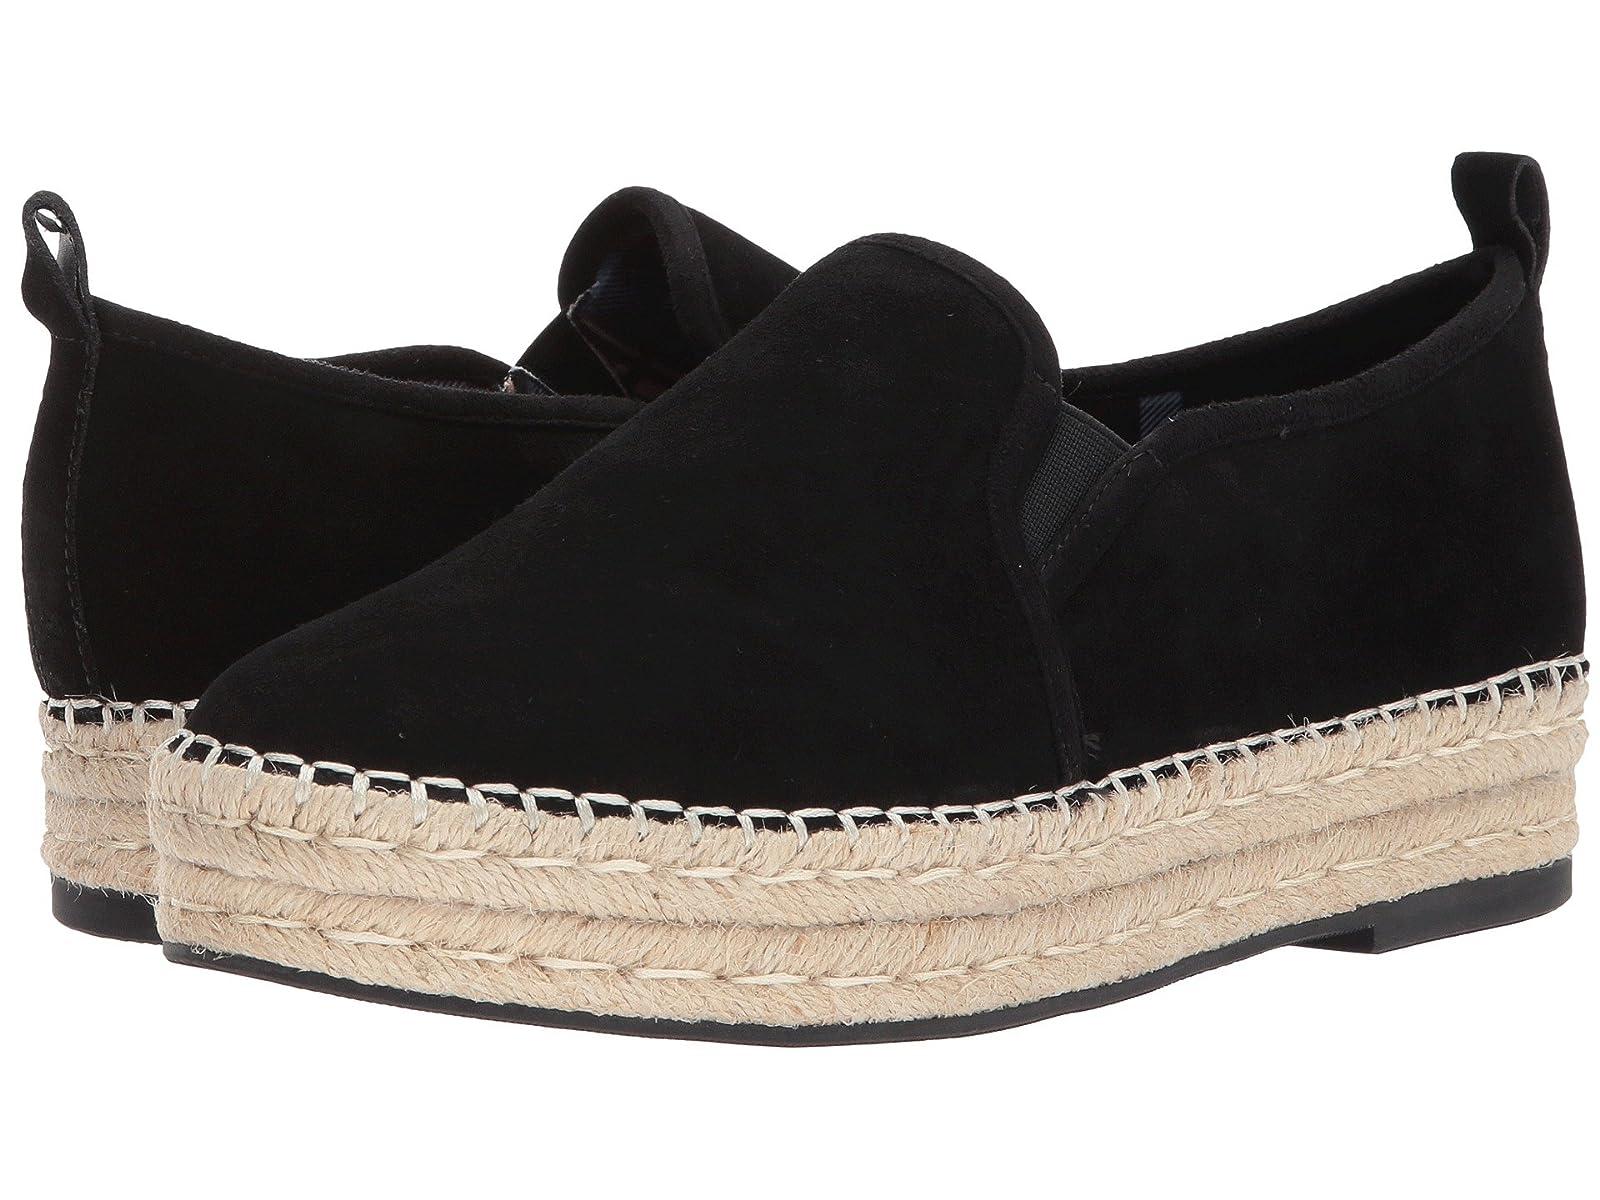 Blondo Basha Waterproof EspadrilleCheap and distinctive eye-catching shoes